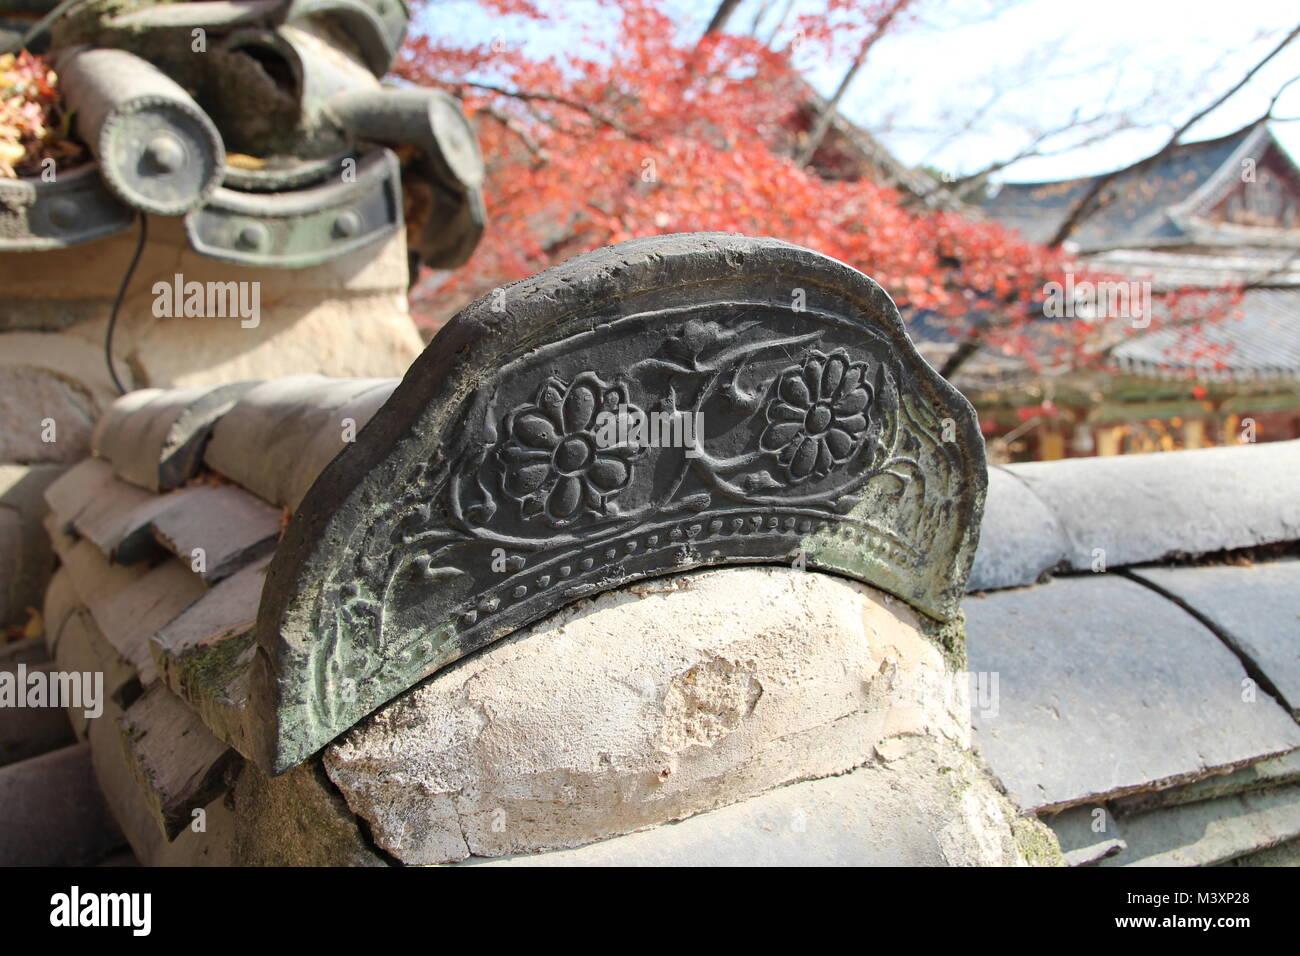 Close-up of traditional Korean ceramic roof tile with flower image on Bulguksa Temple, Gyeong-ju, South Korea Stock Photo